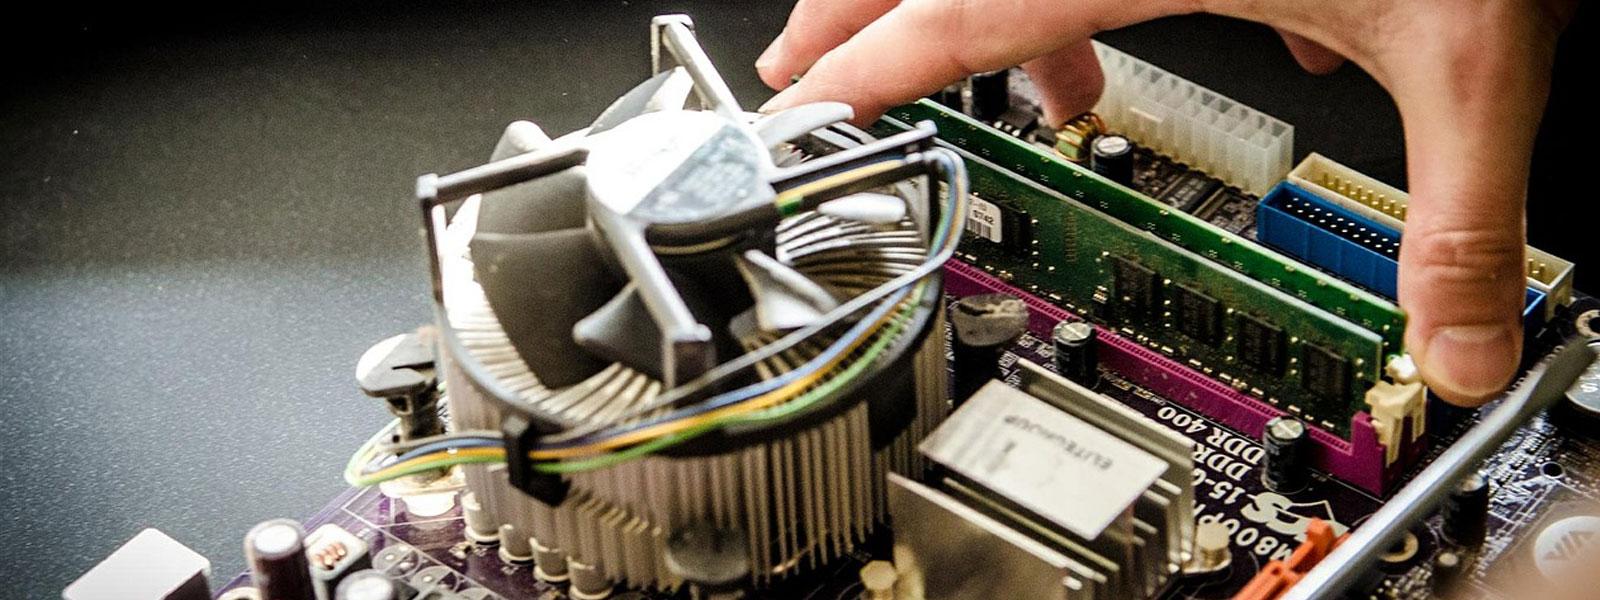 service calculatoare si laptopuri arad